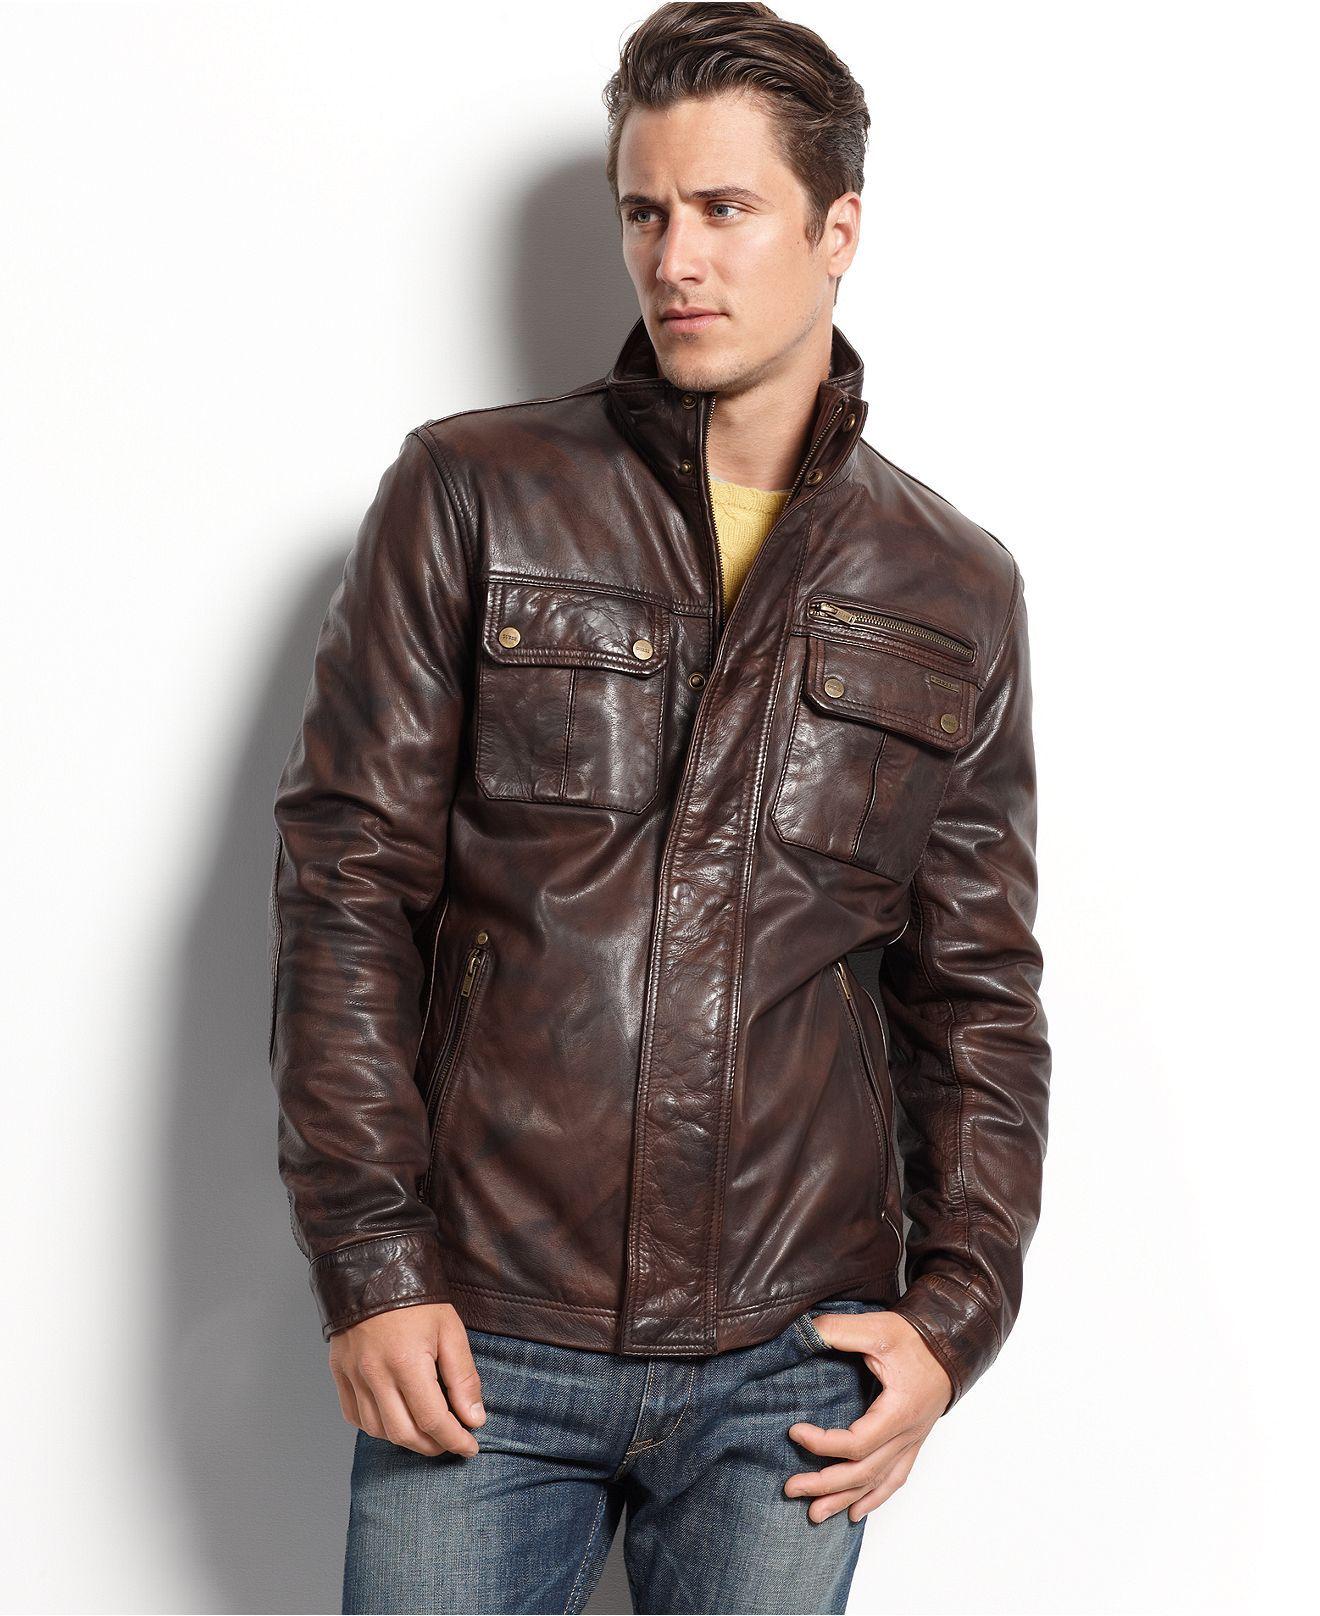 Guess Coat, MediumWeight Leather Jacket Mens Coats